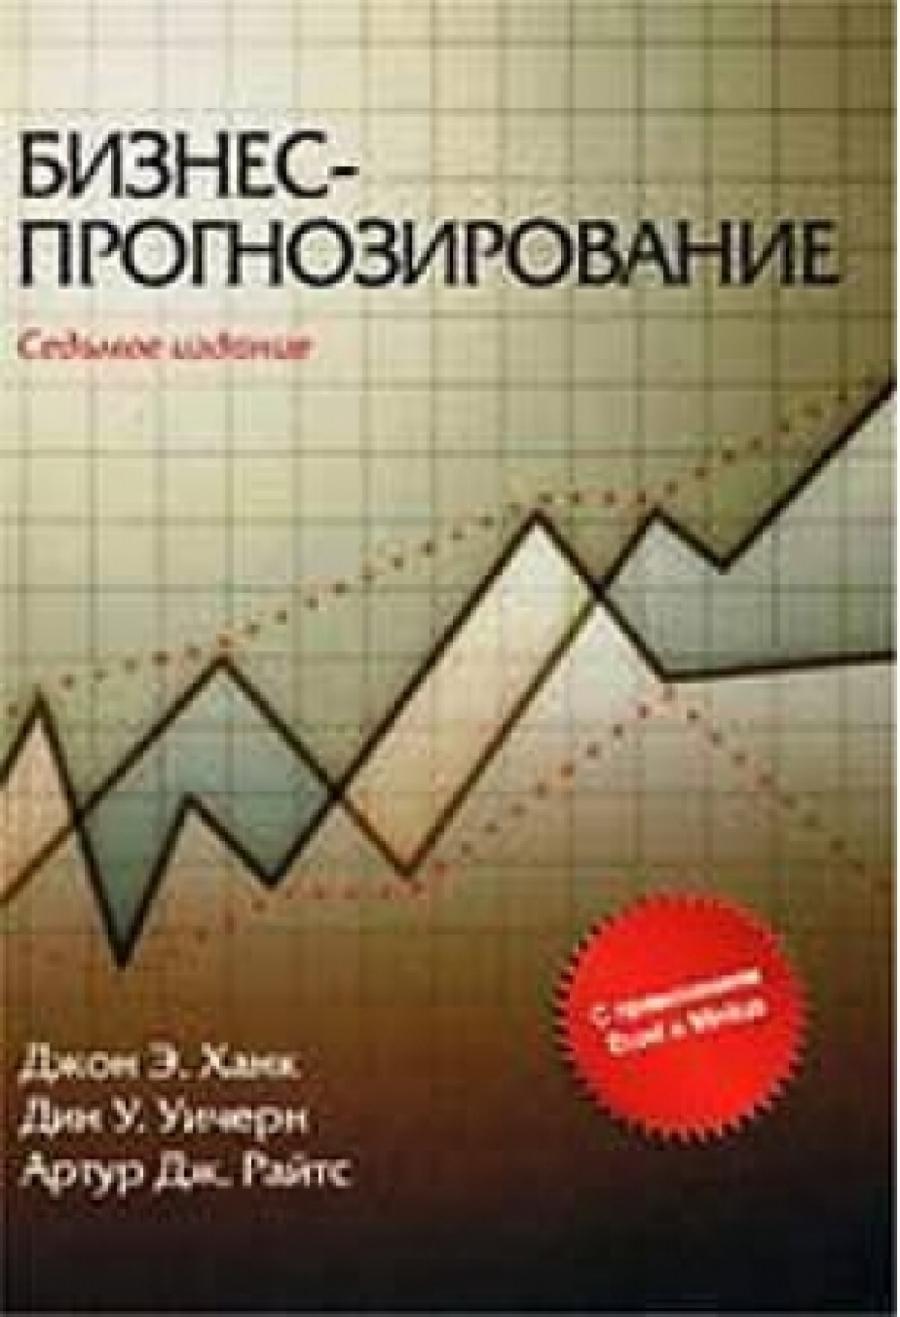 Обложка книги:  john e. hanke (ханк д.э), райтс а.дж., уичерн д.у. - бизнес-прогнозирование, 7-е издание